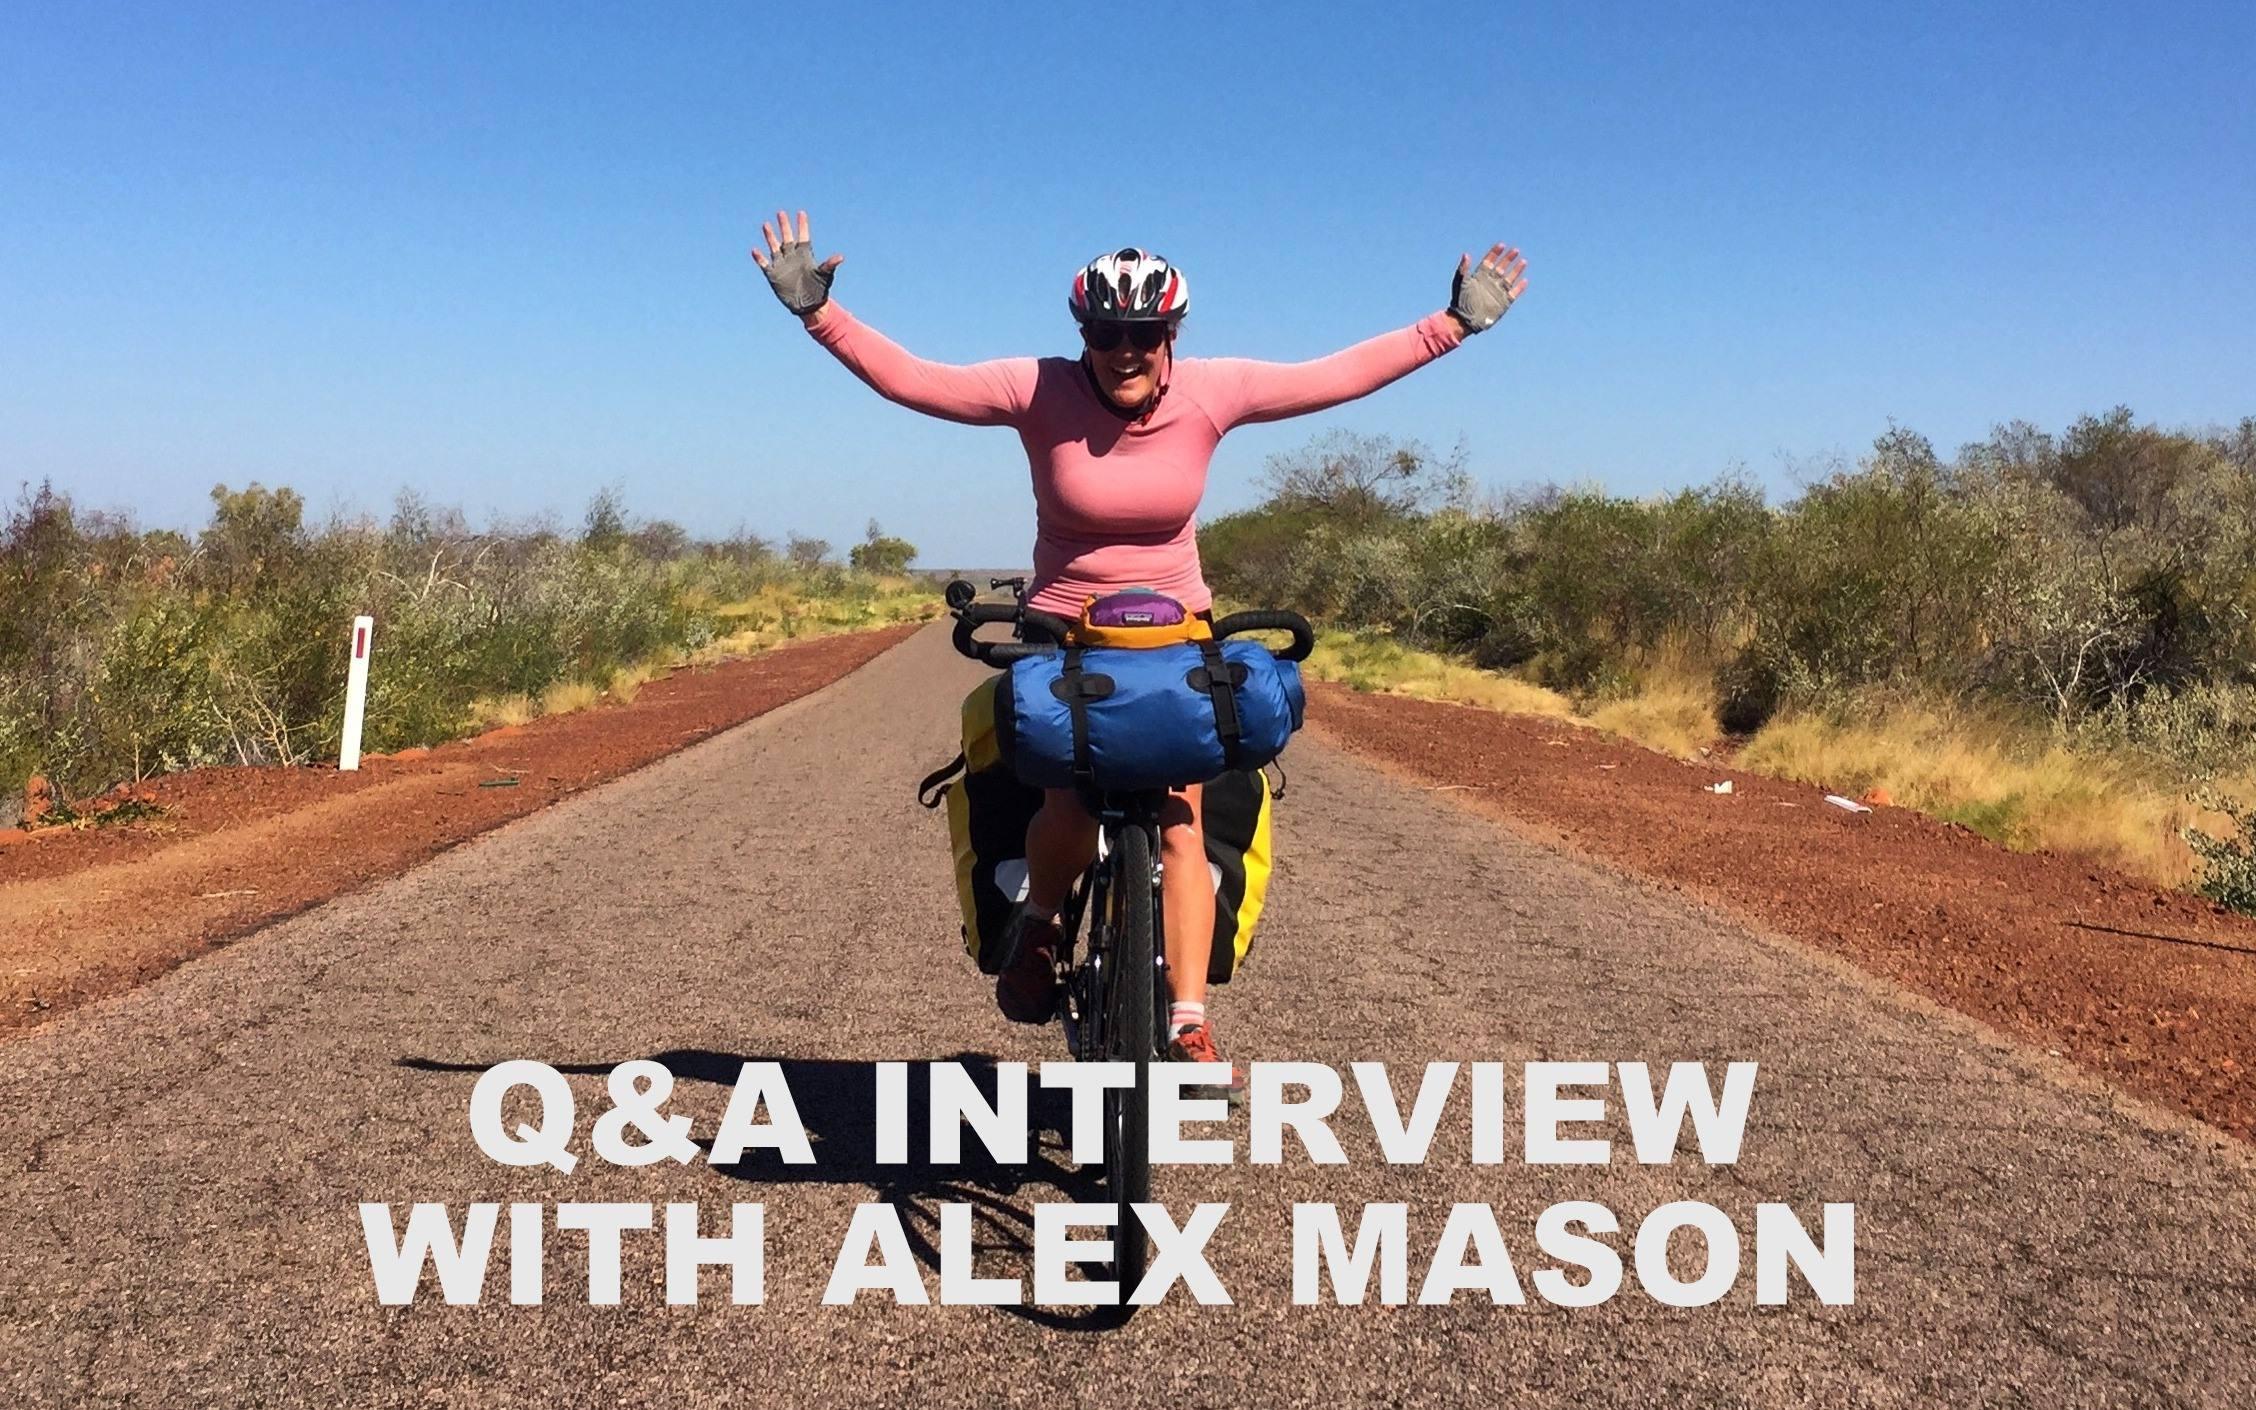 Q&A interview with Alex Mason